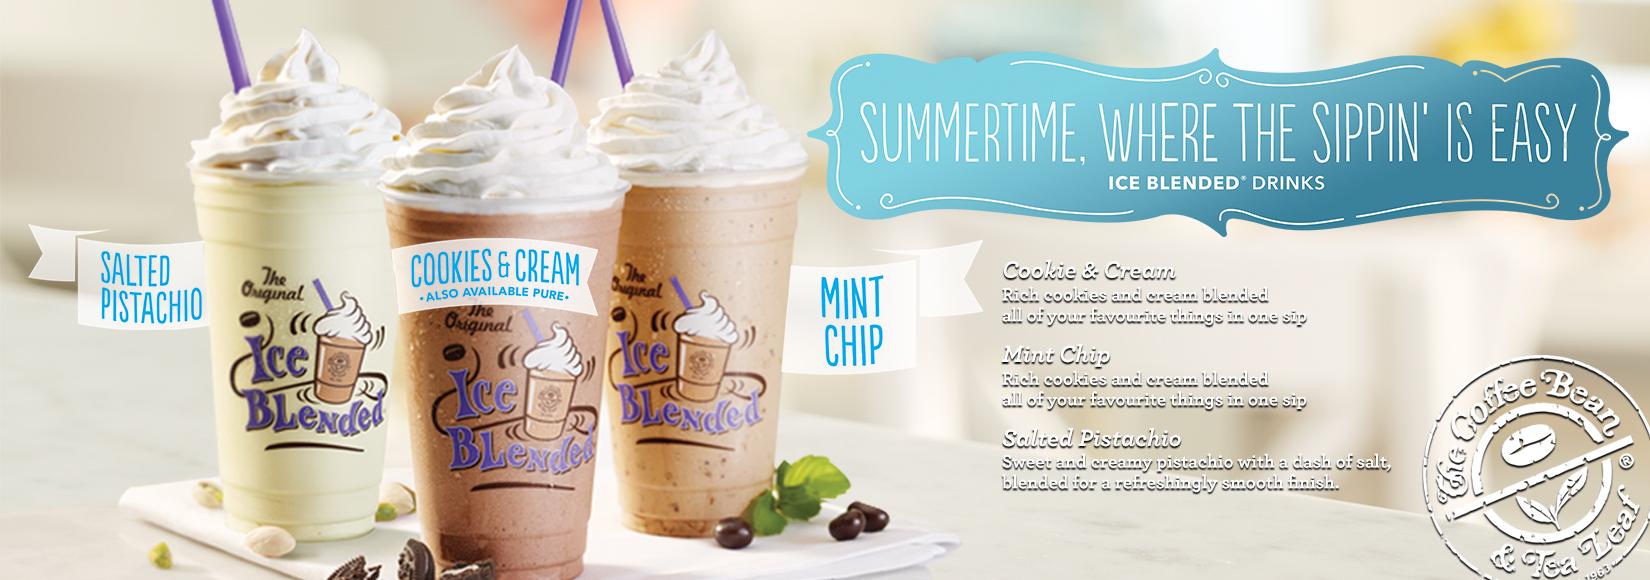 pist-mint-cookie-promotion-drink